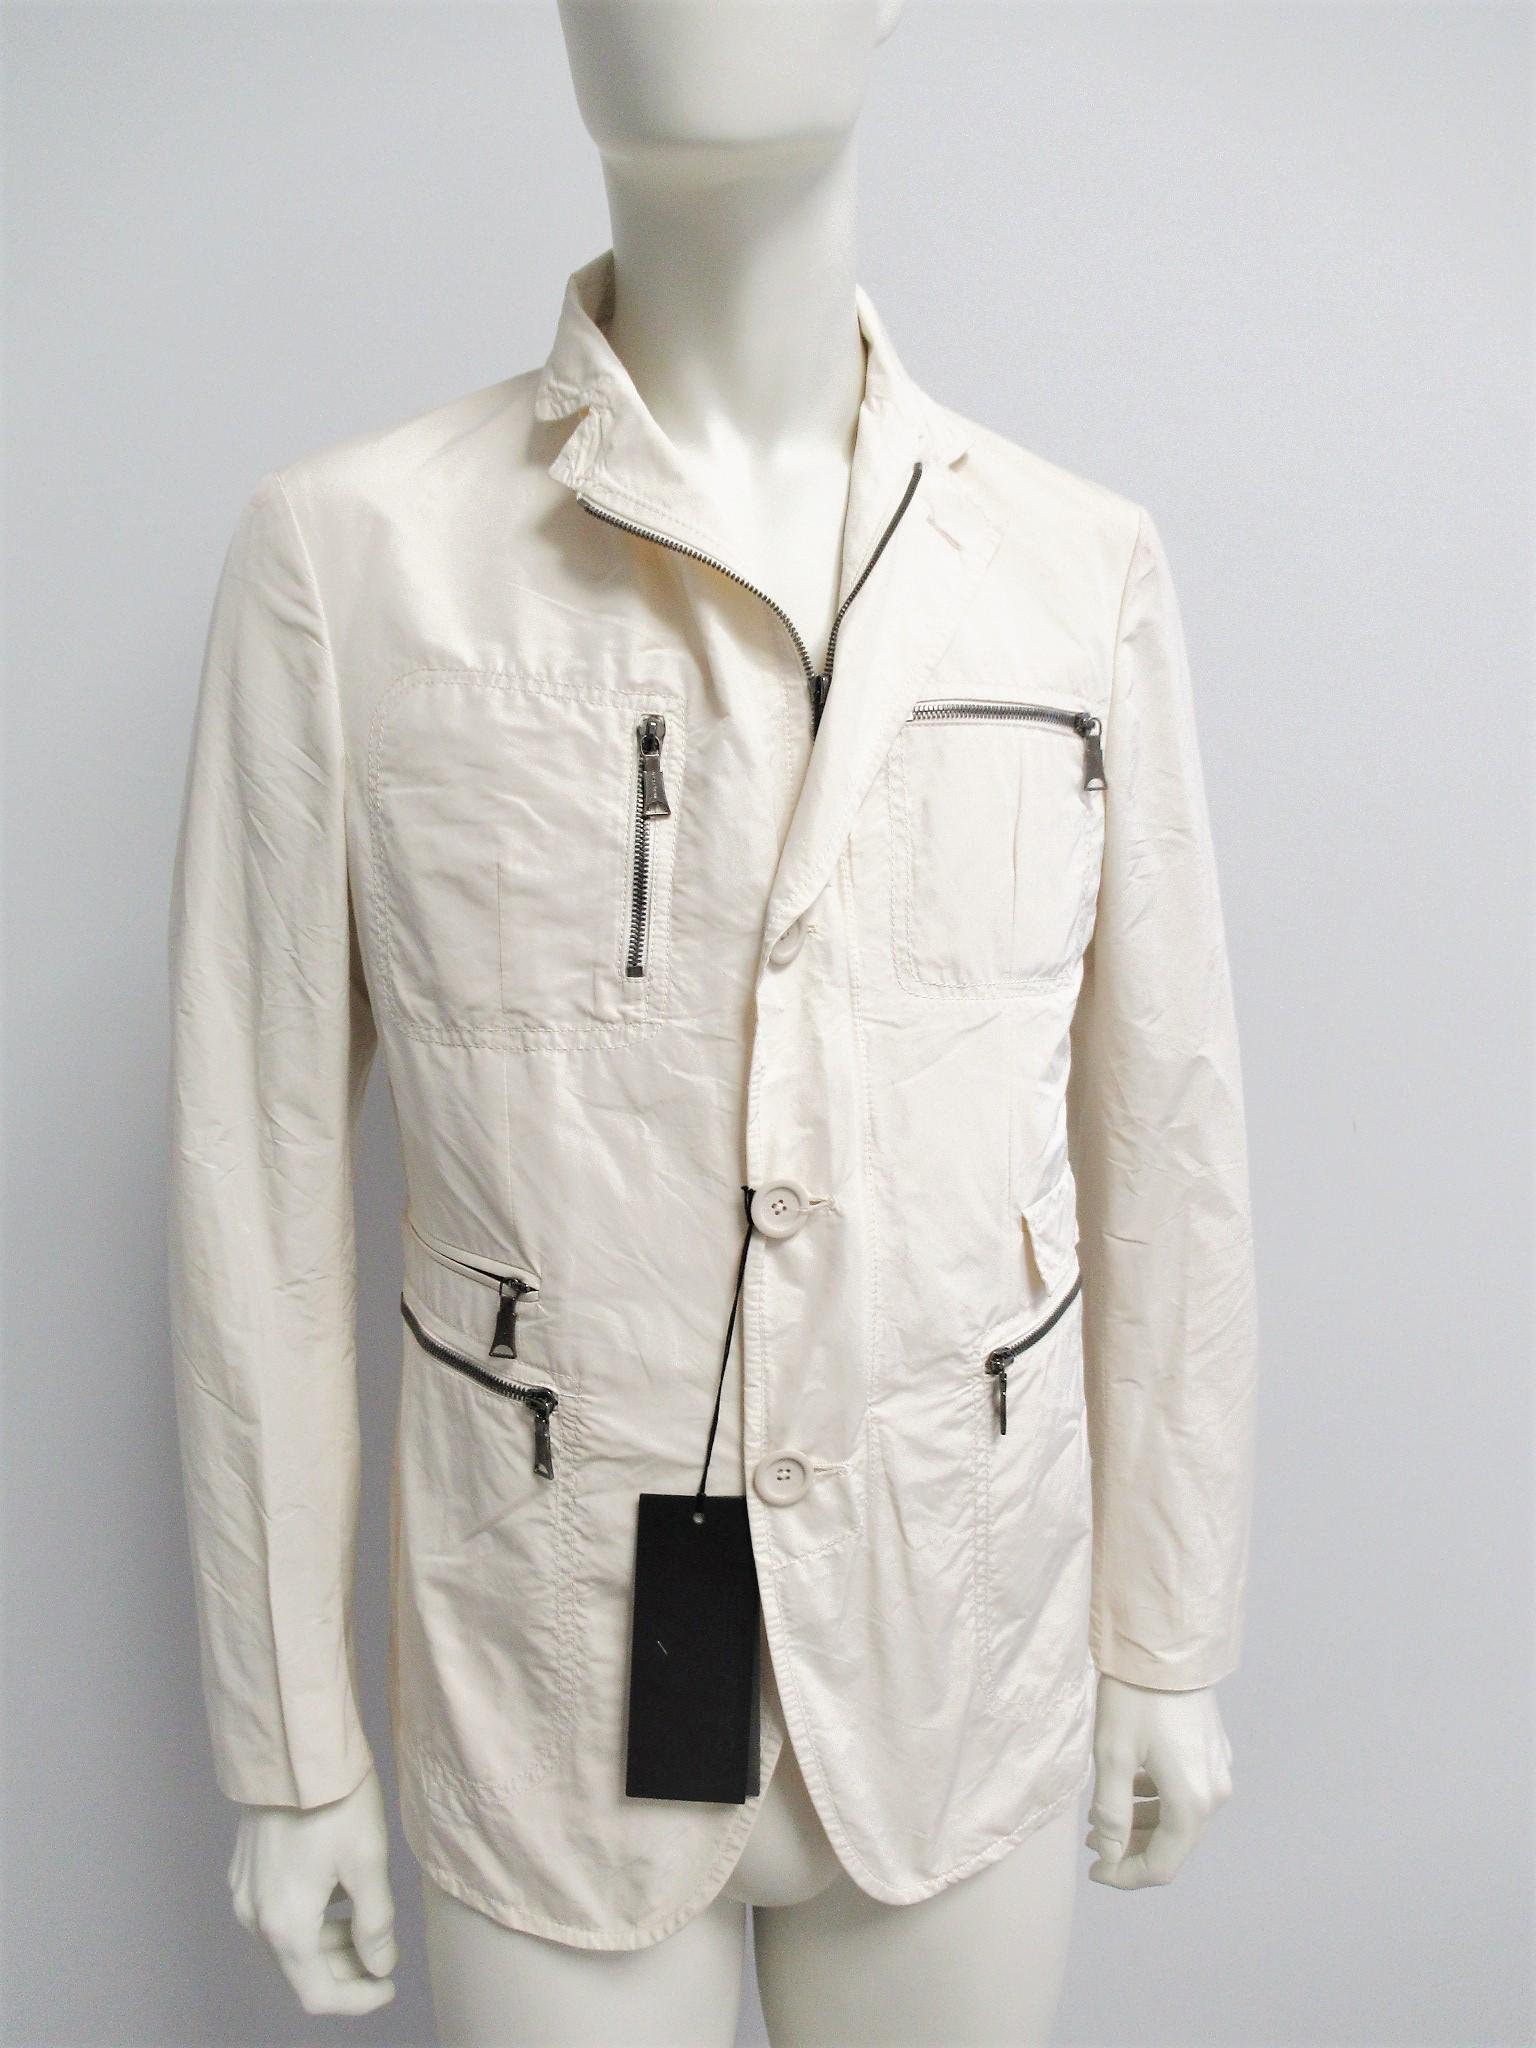 """CALVARESI"" Exclusive tailored jacket Size S"